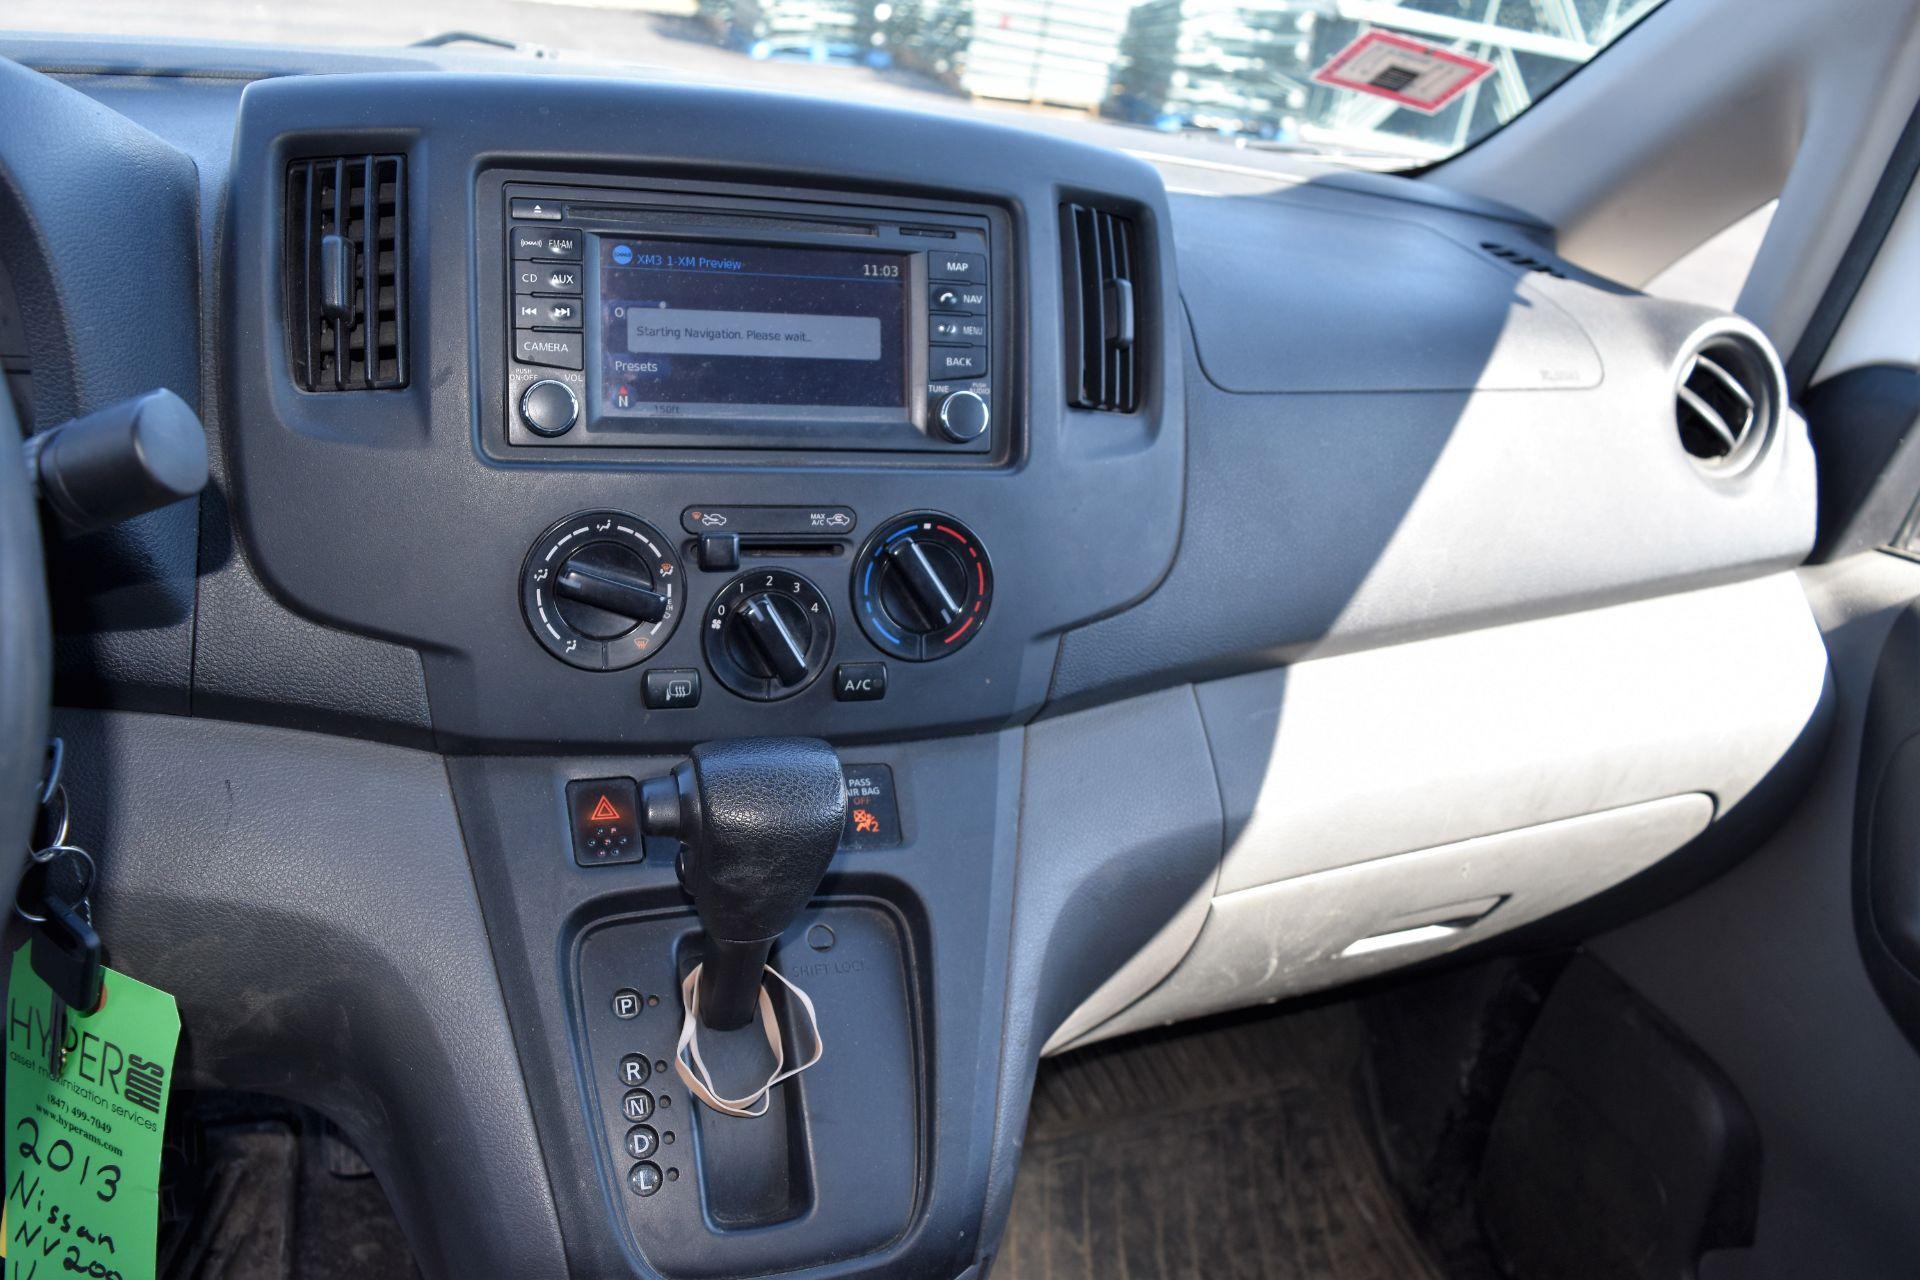 2013 Nissan NV200 Delivery Van - Image 43 of 54